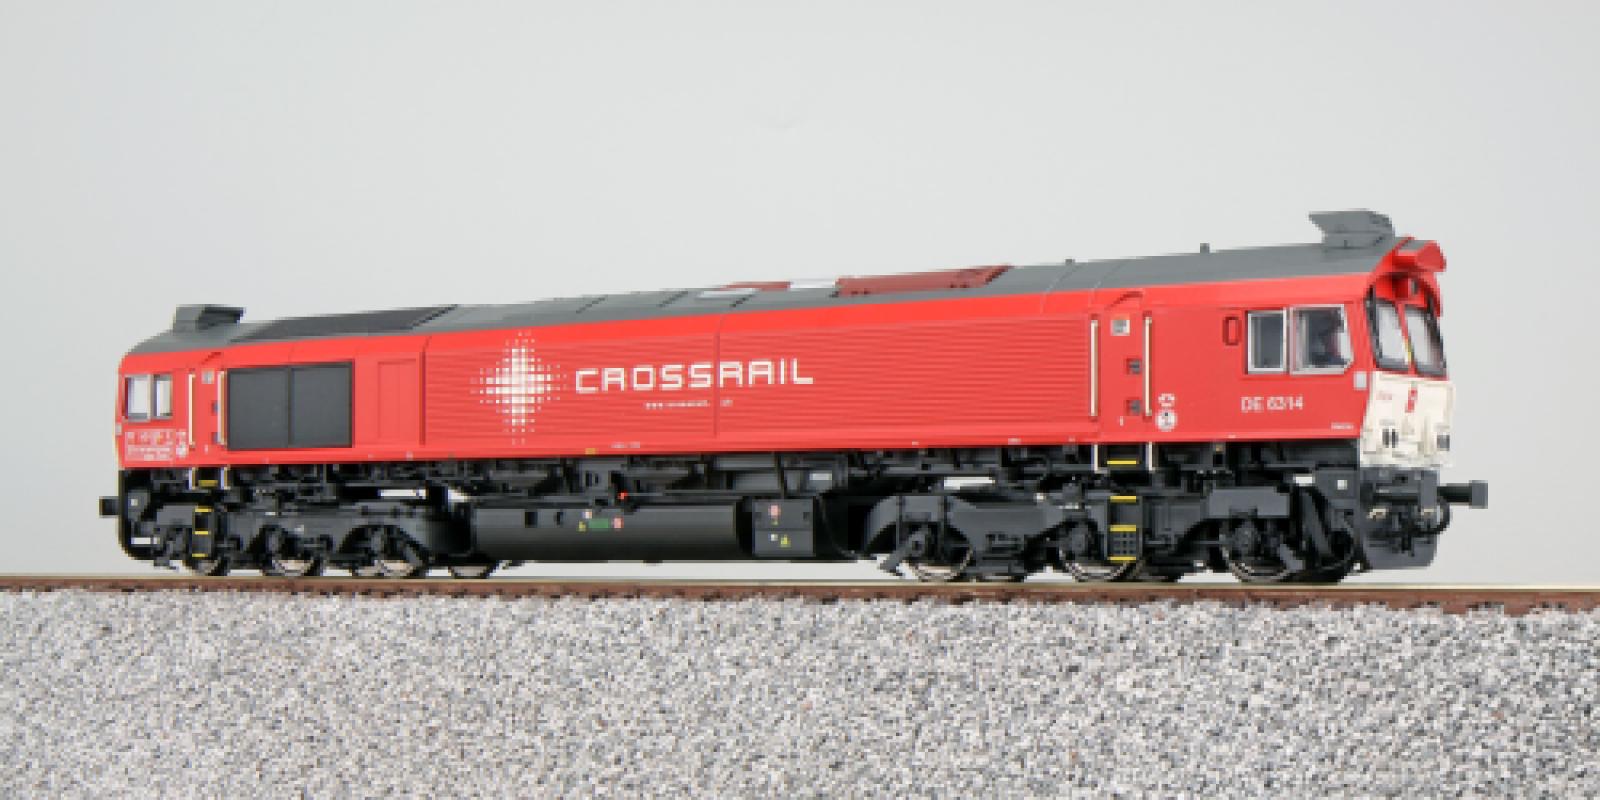 ES31274Diesel loco, Crossrail DE 6314, red, Ep VI, Sound+Smoke, DC/AC